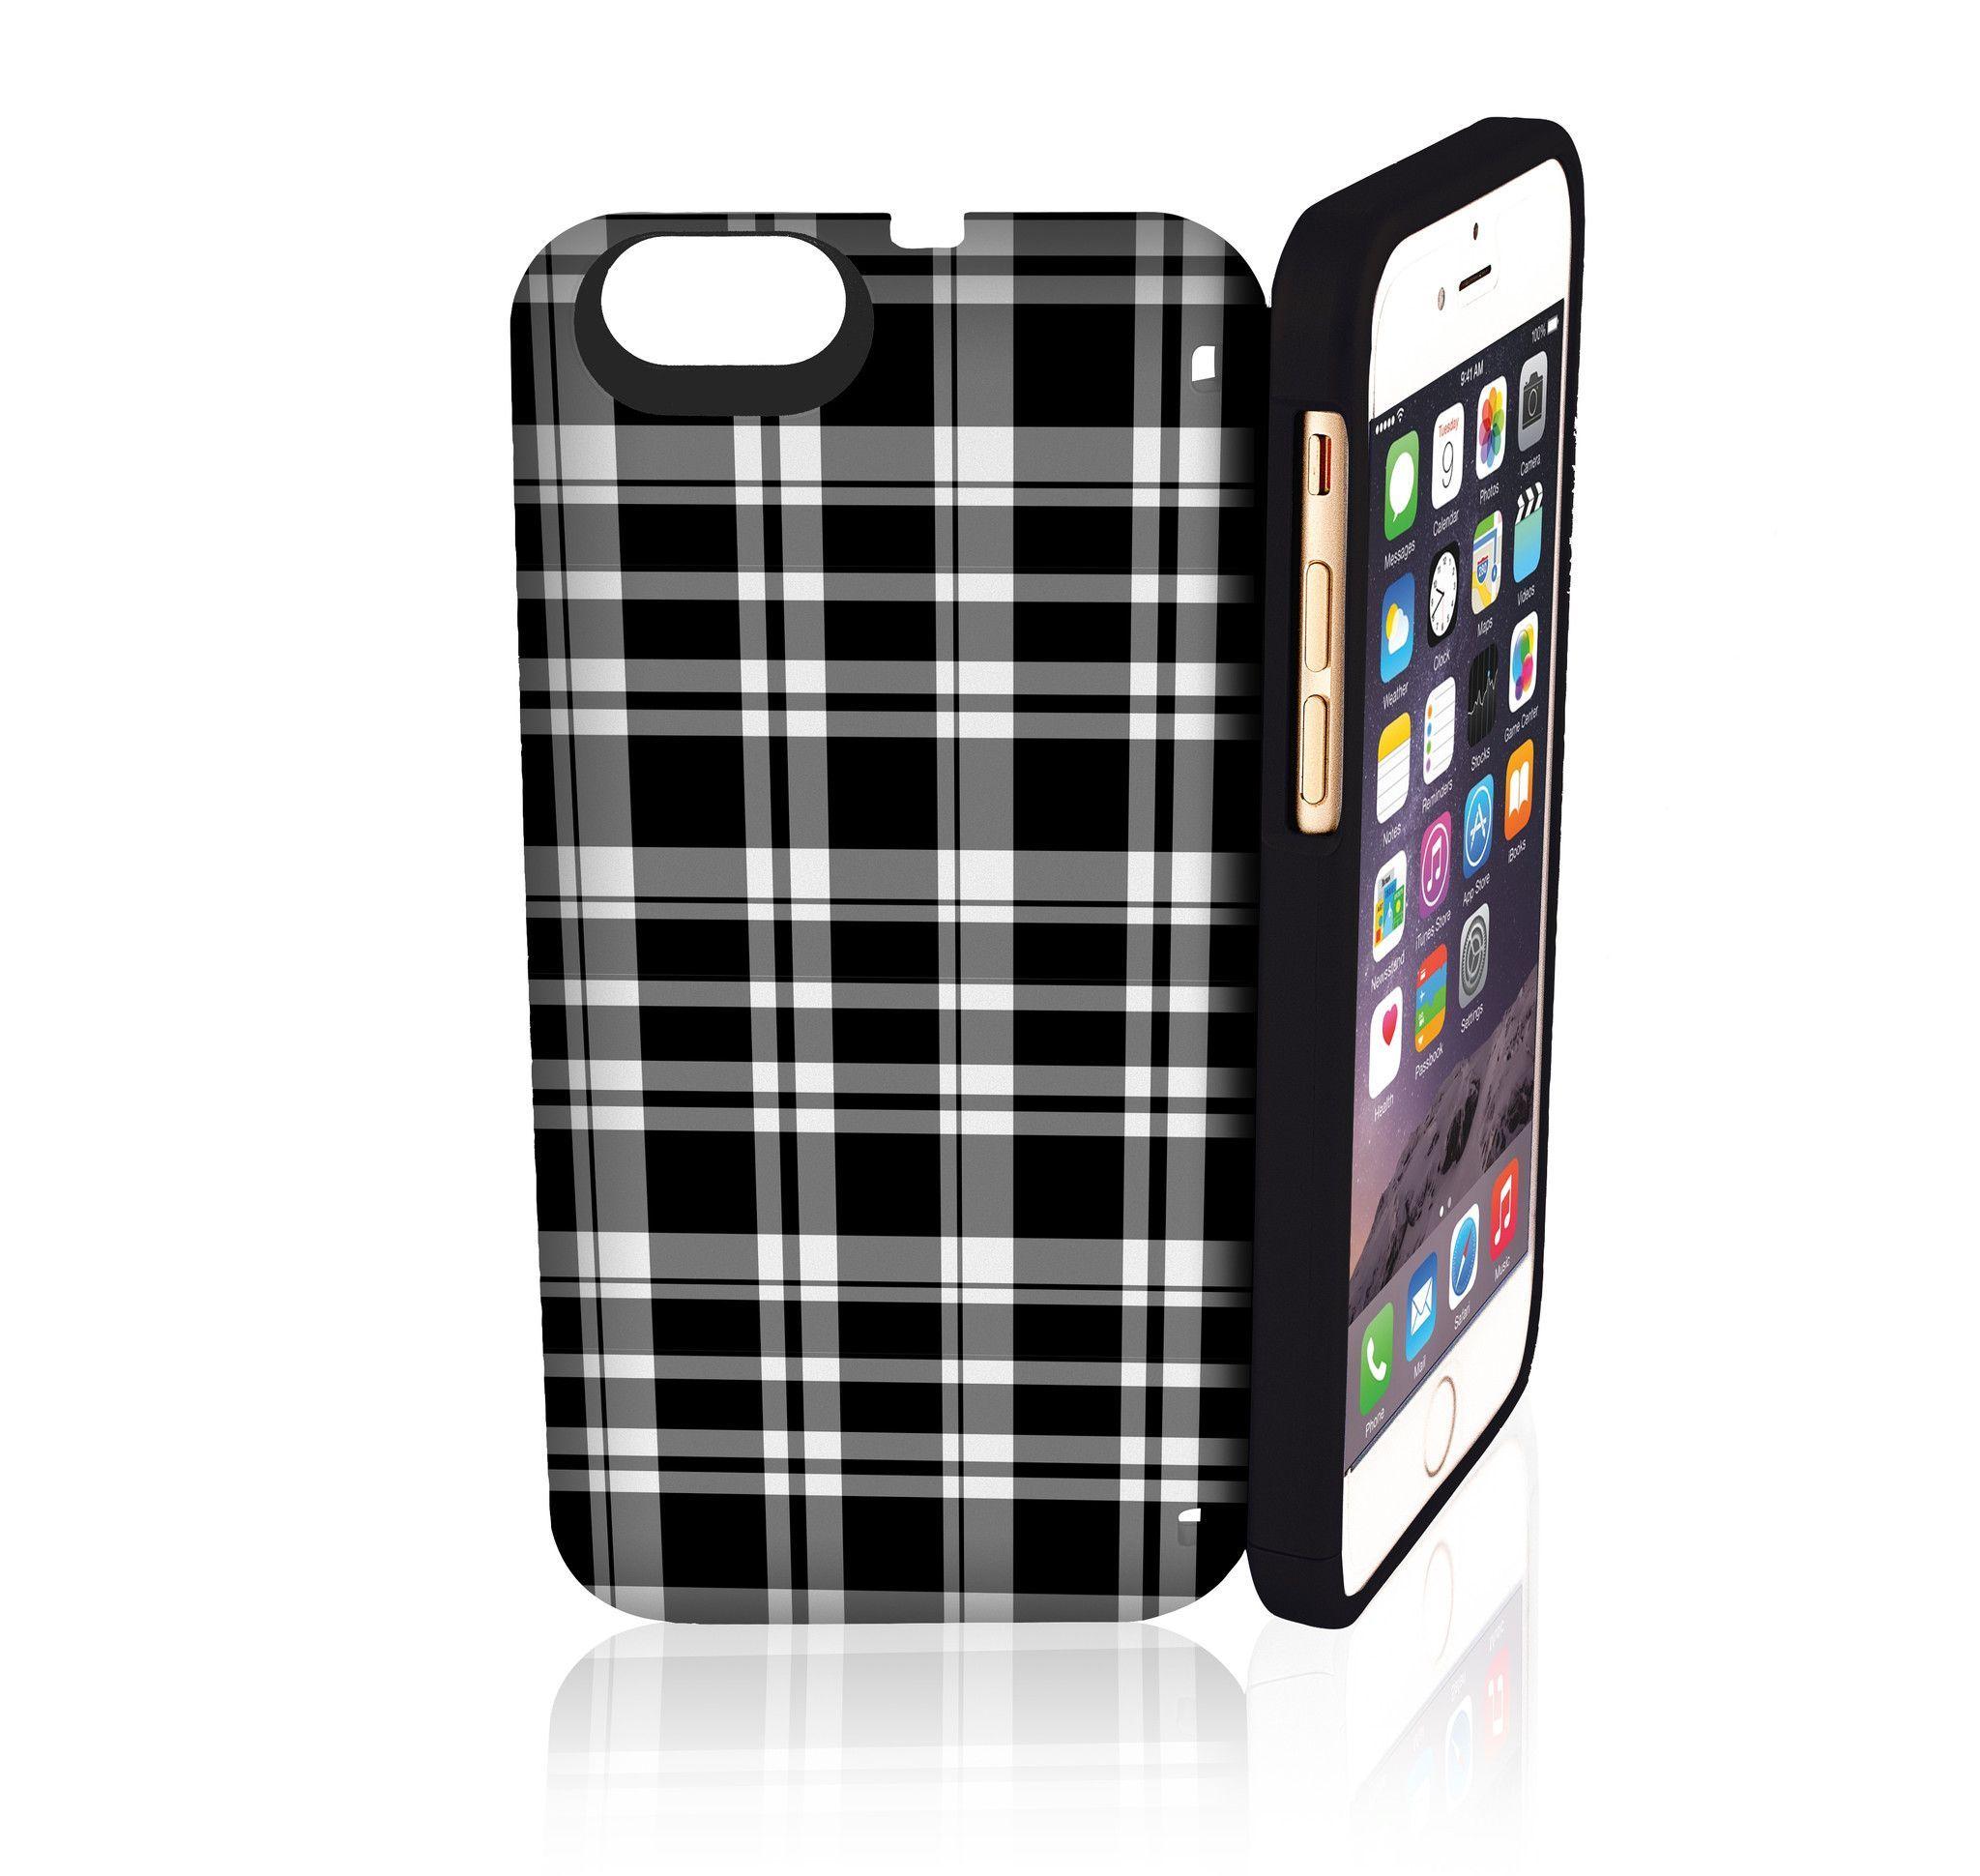 eyn for iPhone 6 Plus/6s Plus